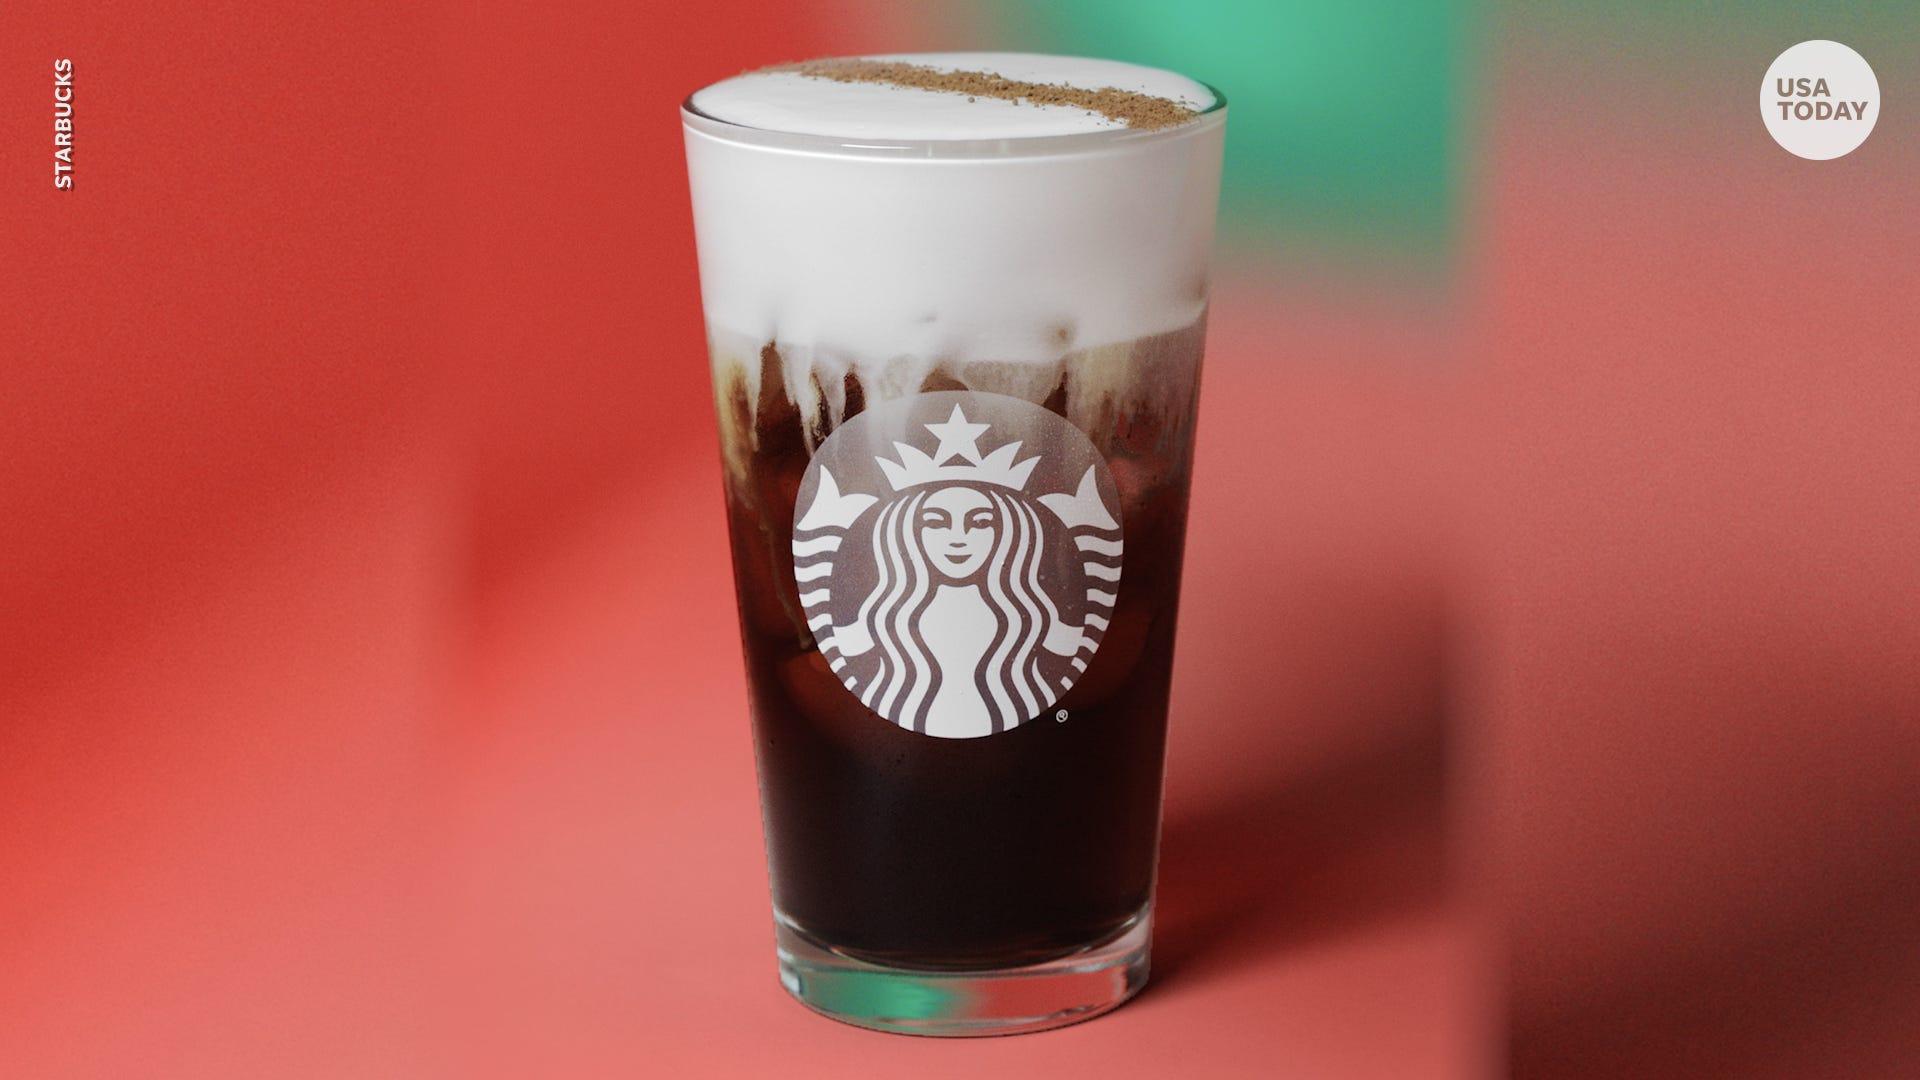 Contest returns, new Irish Cream Cold Brew